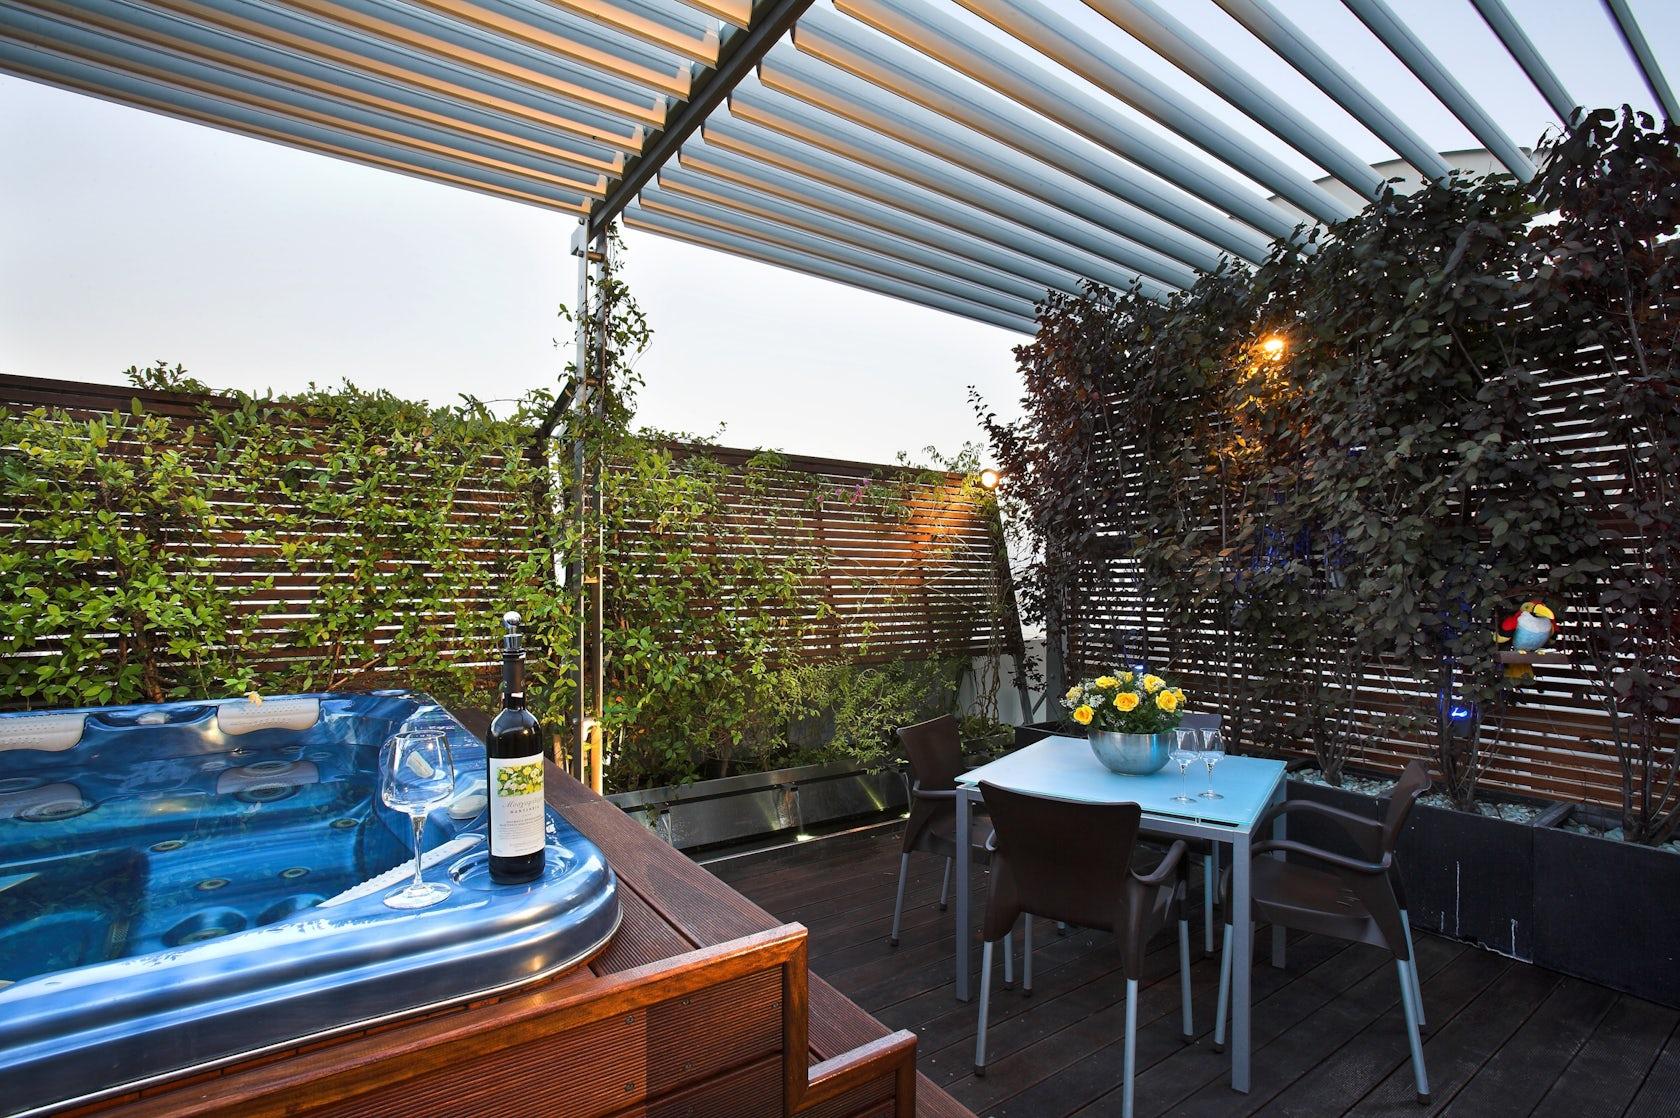 Roof Garden Nicosia - Architizer